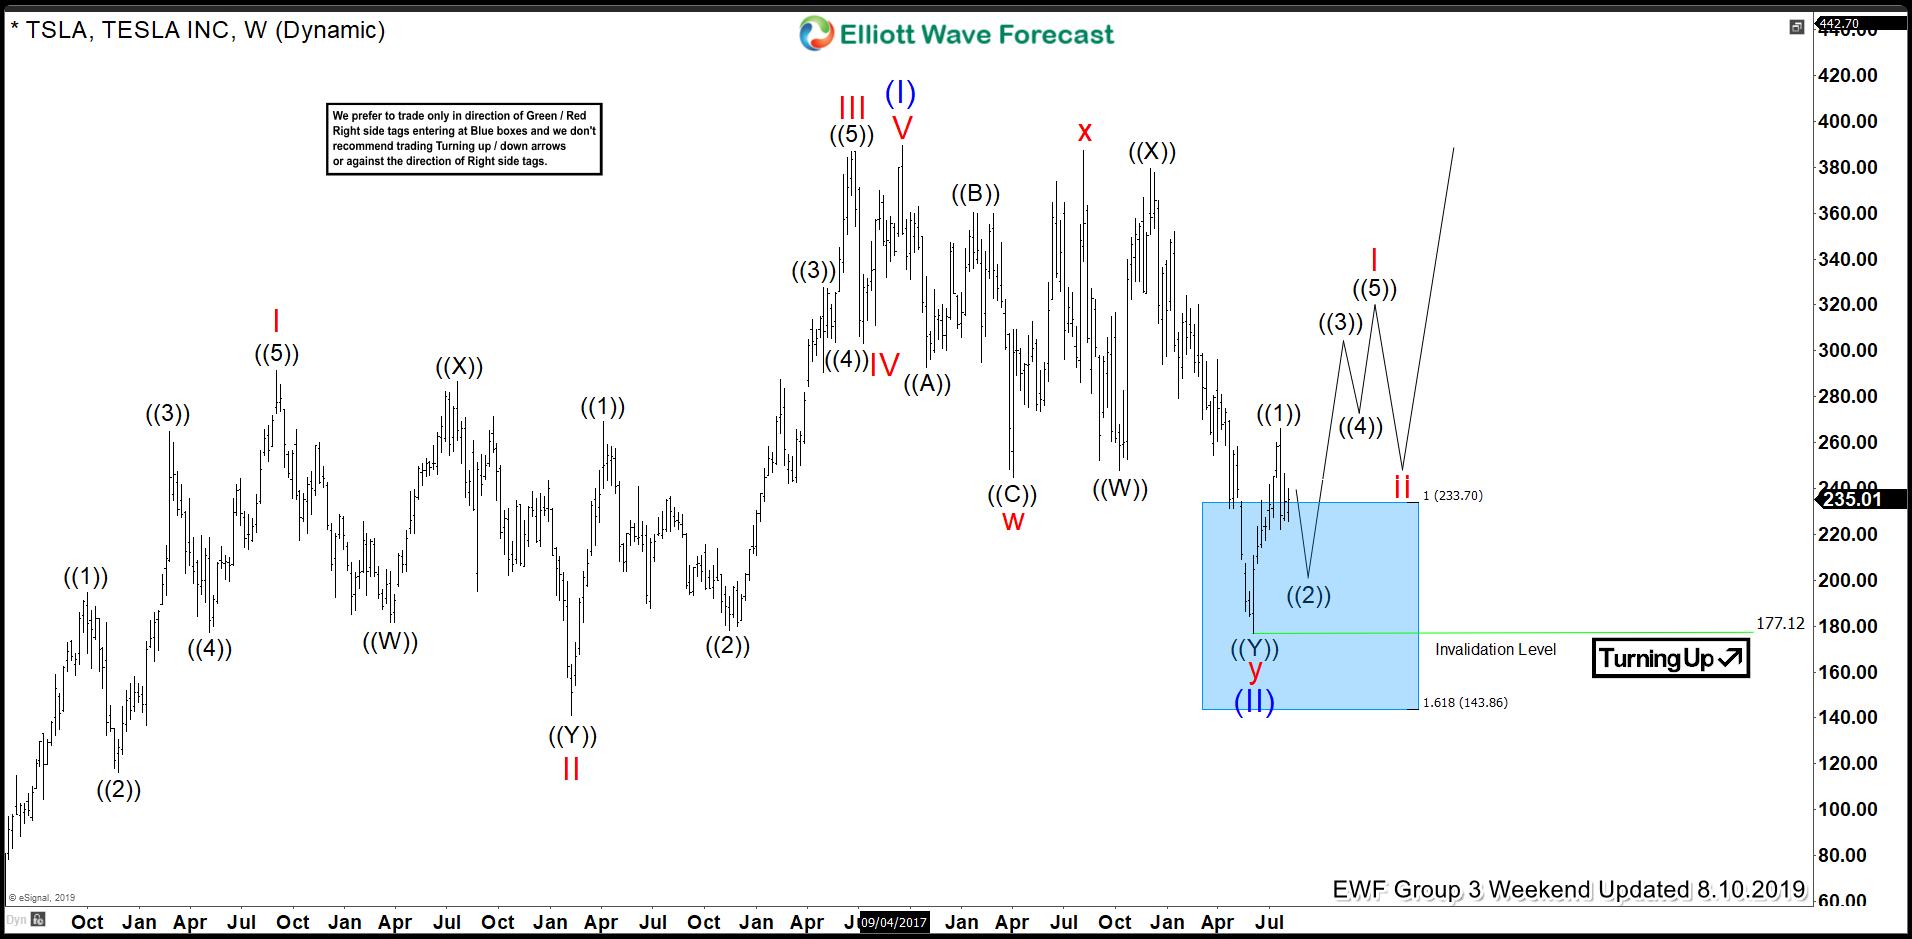 TSLA Powerful Elliott Wave (III) Started From The Blue Box